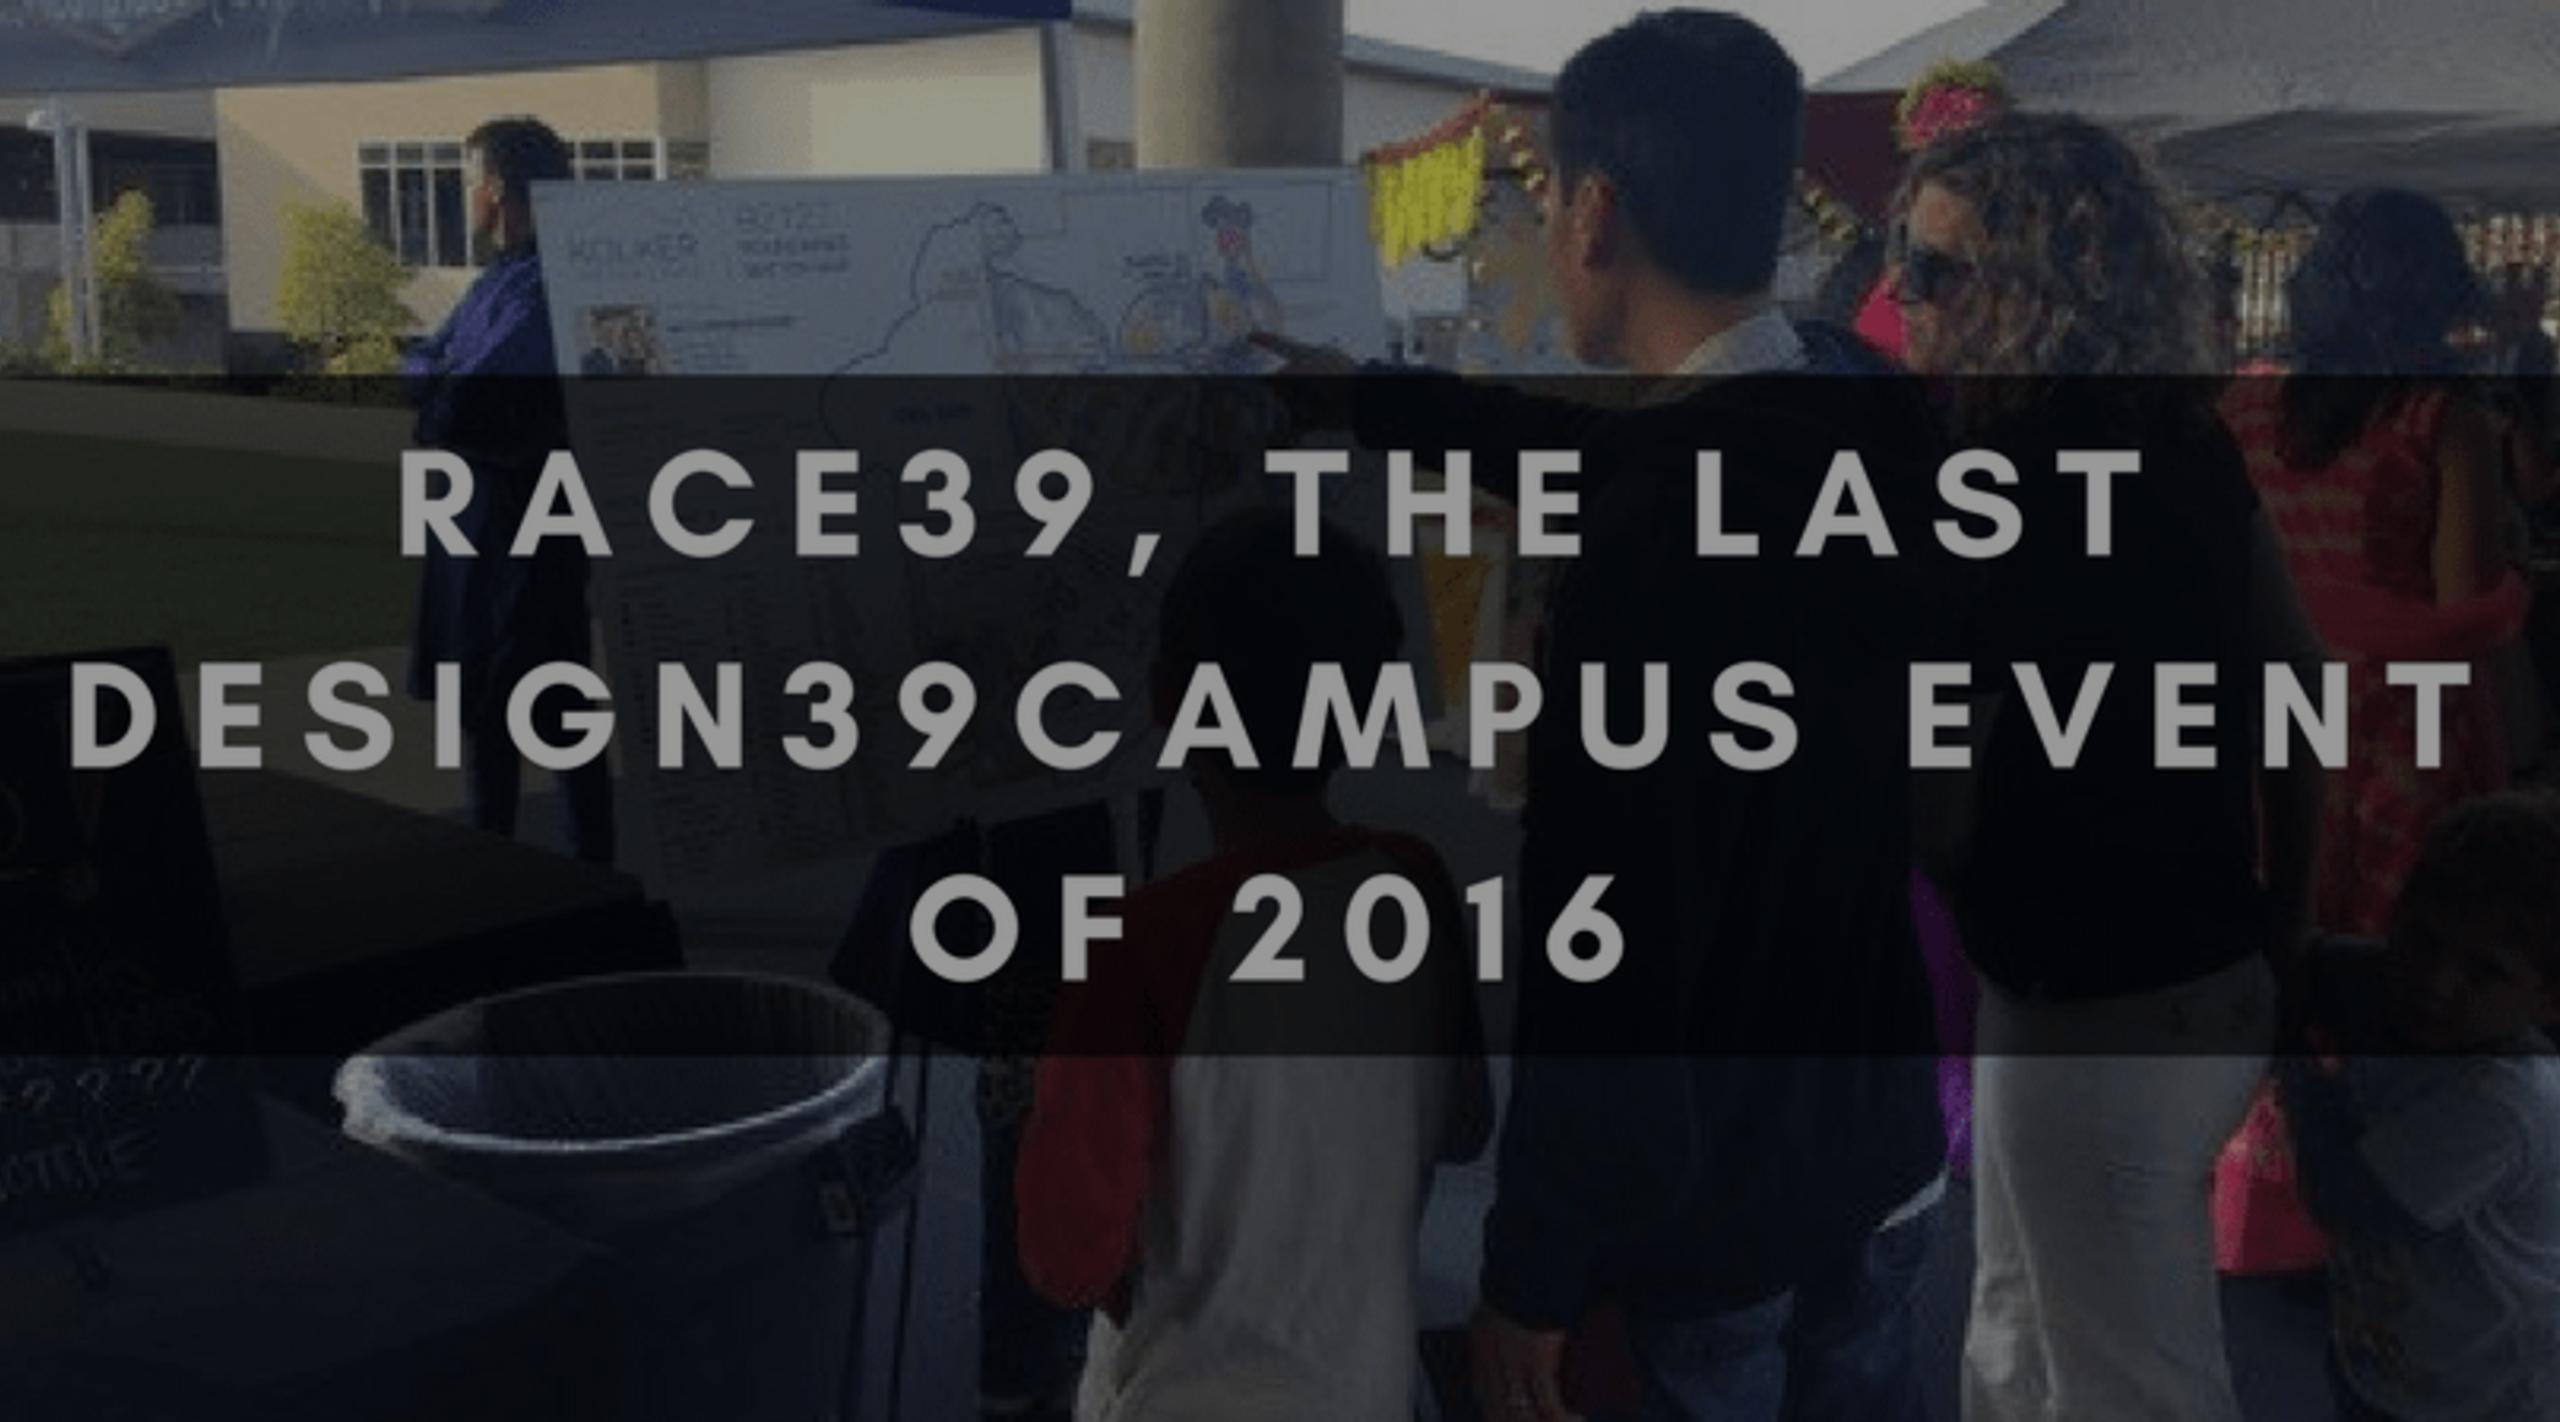 RACE39 | THE LAST DESIGN39CAMPUS EVENT OF 2016